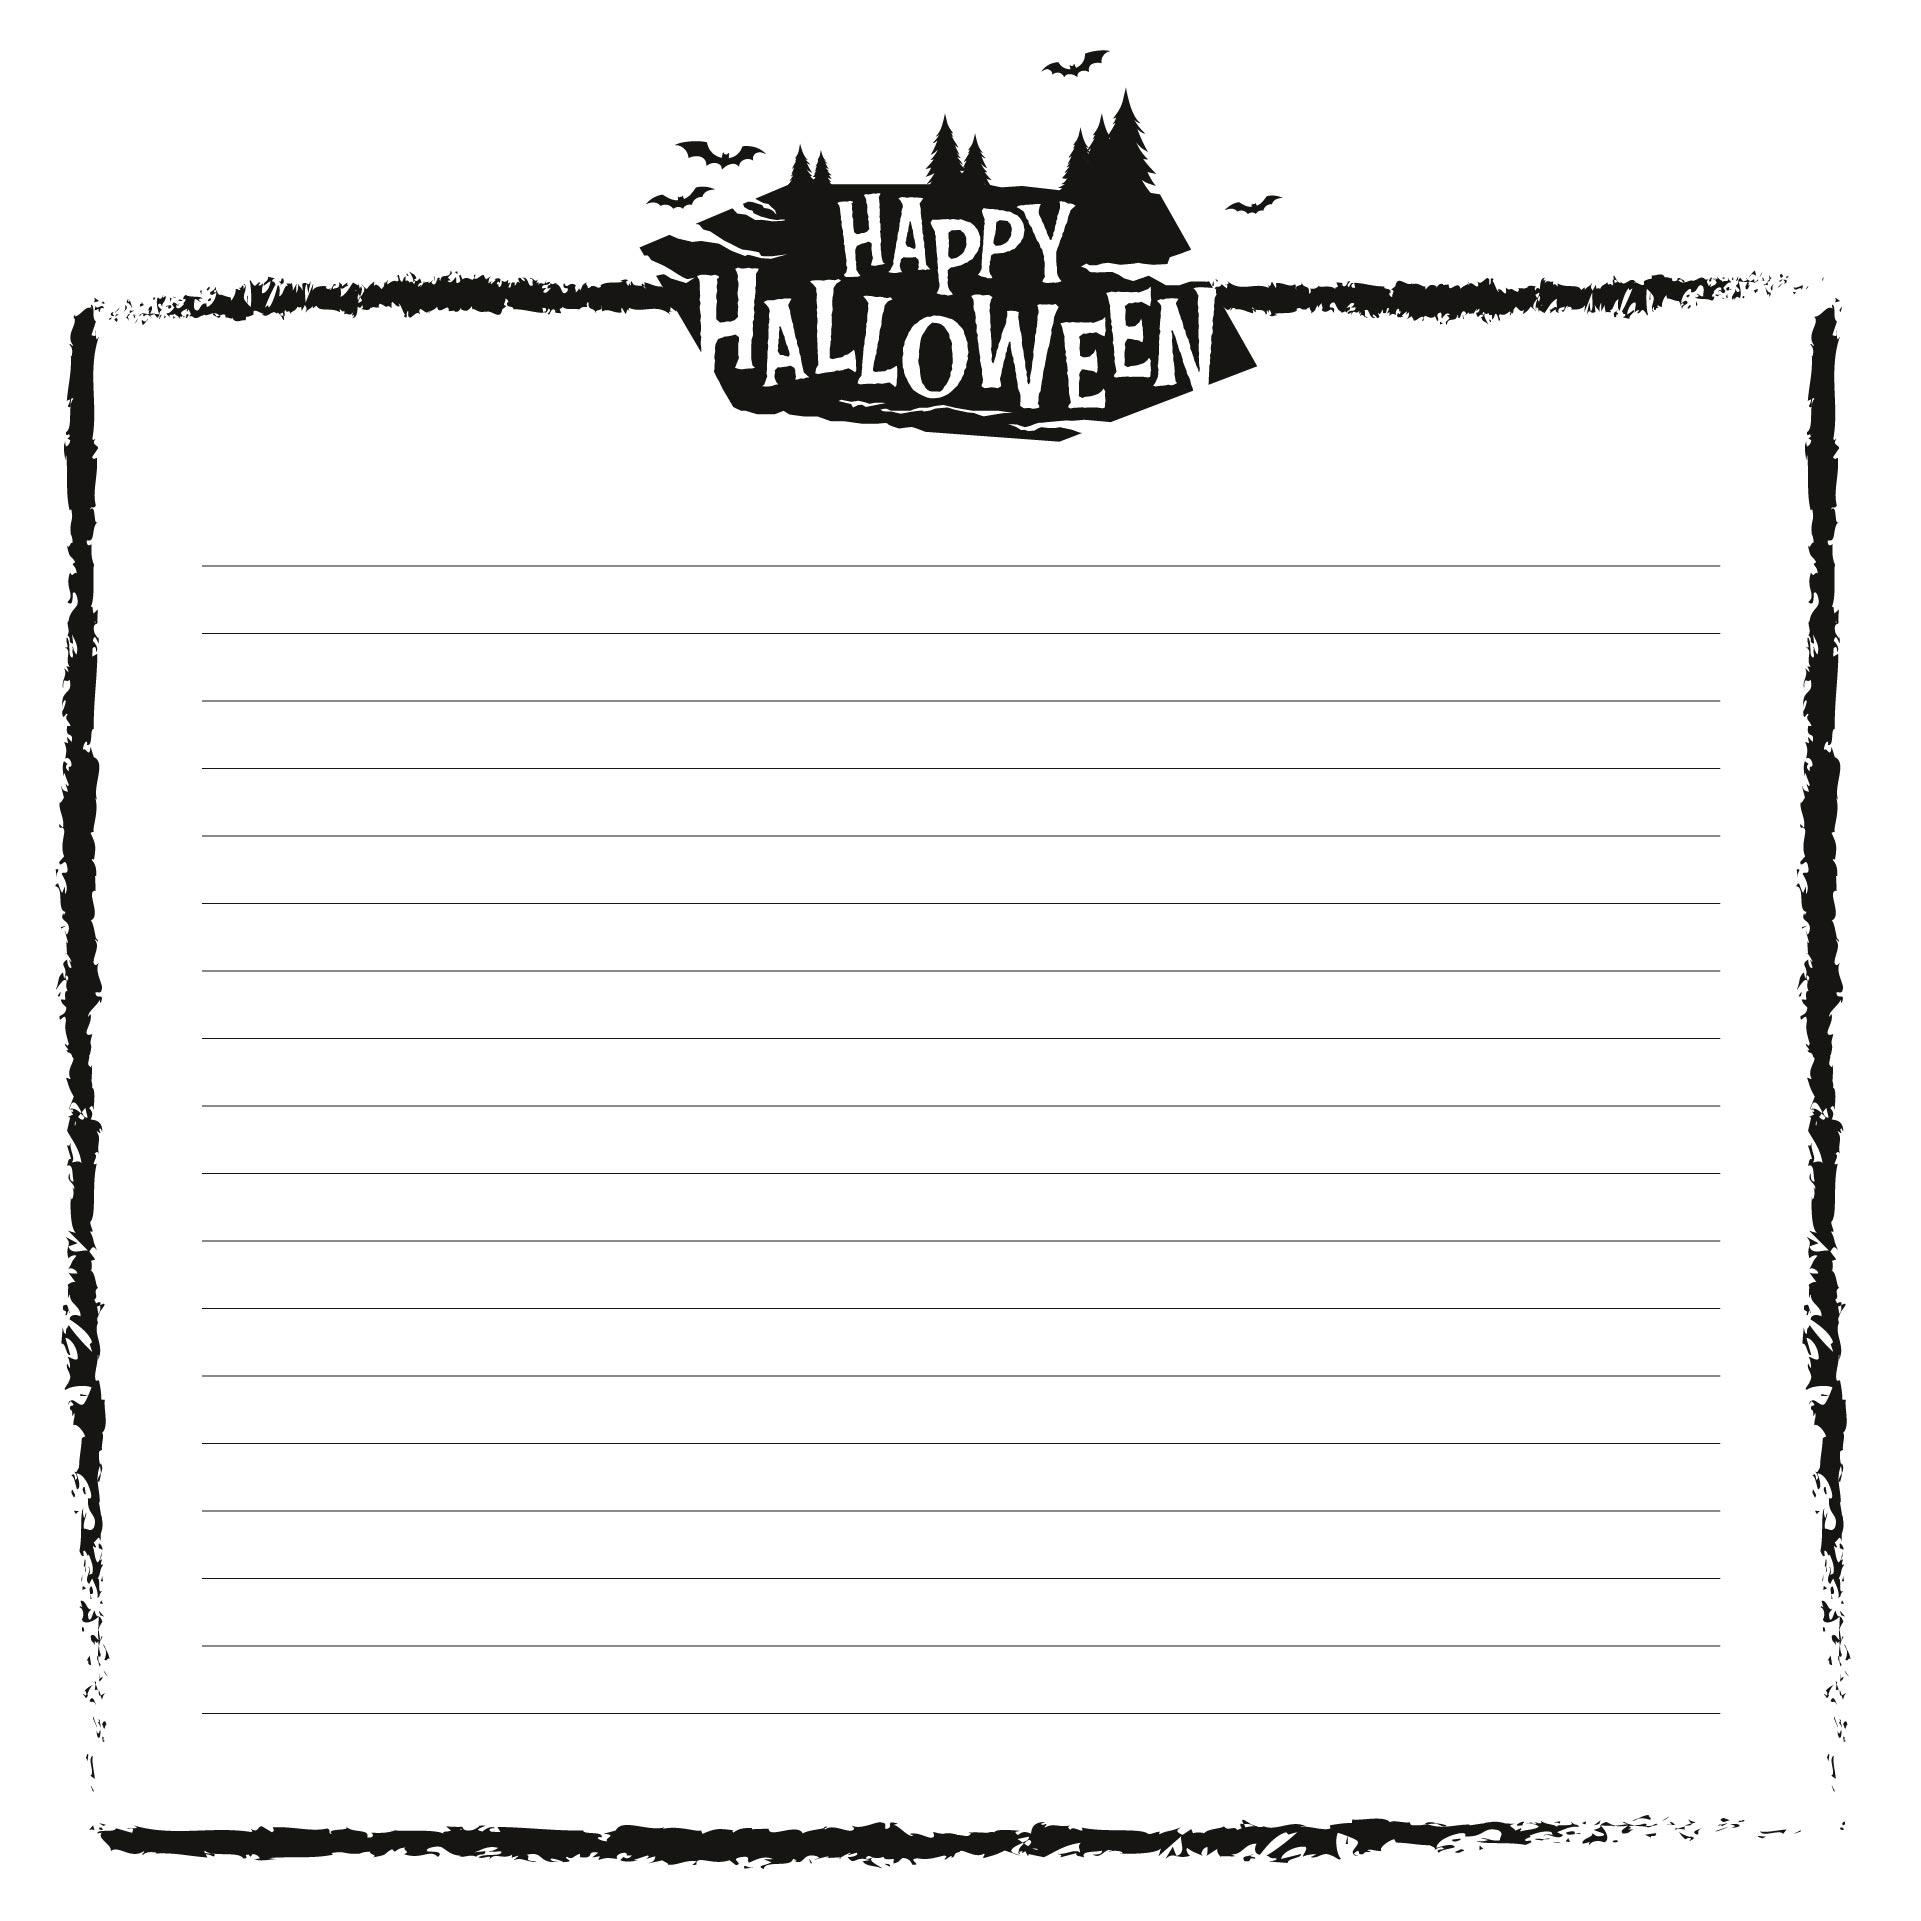 Halloween Fun Border Papers